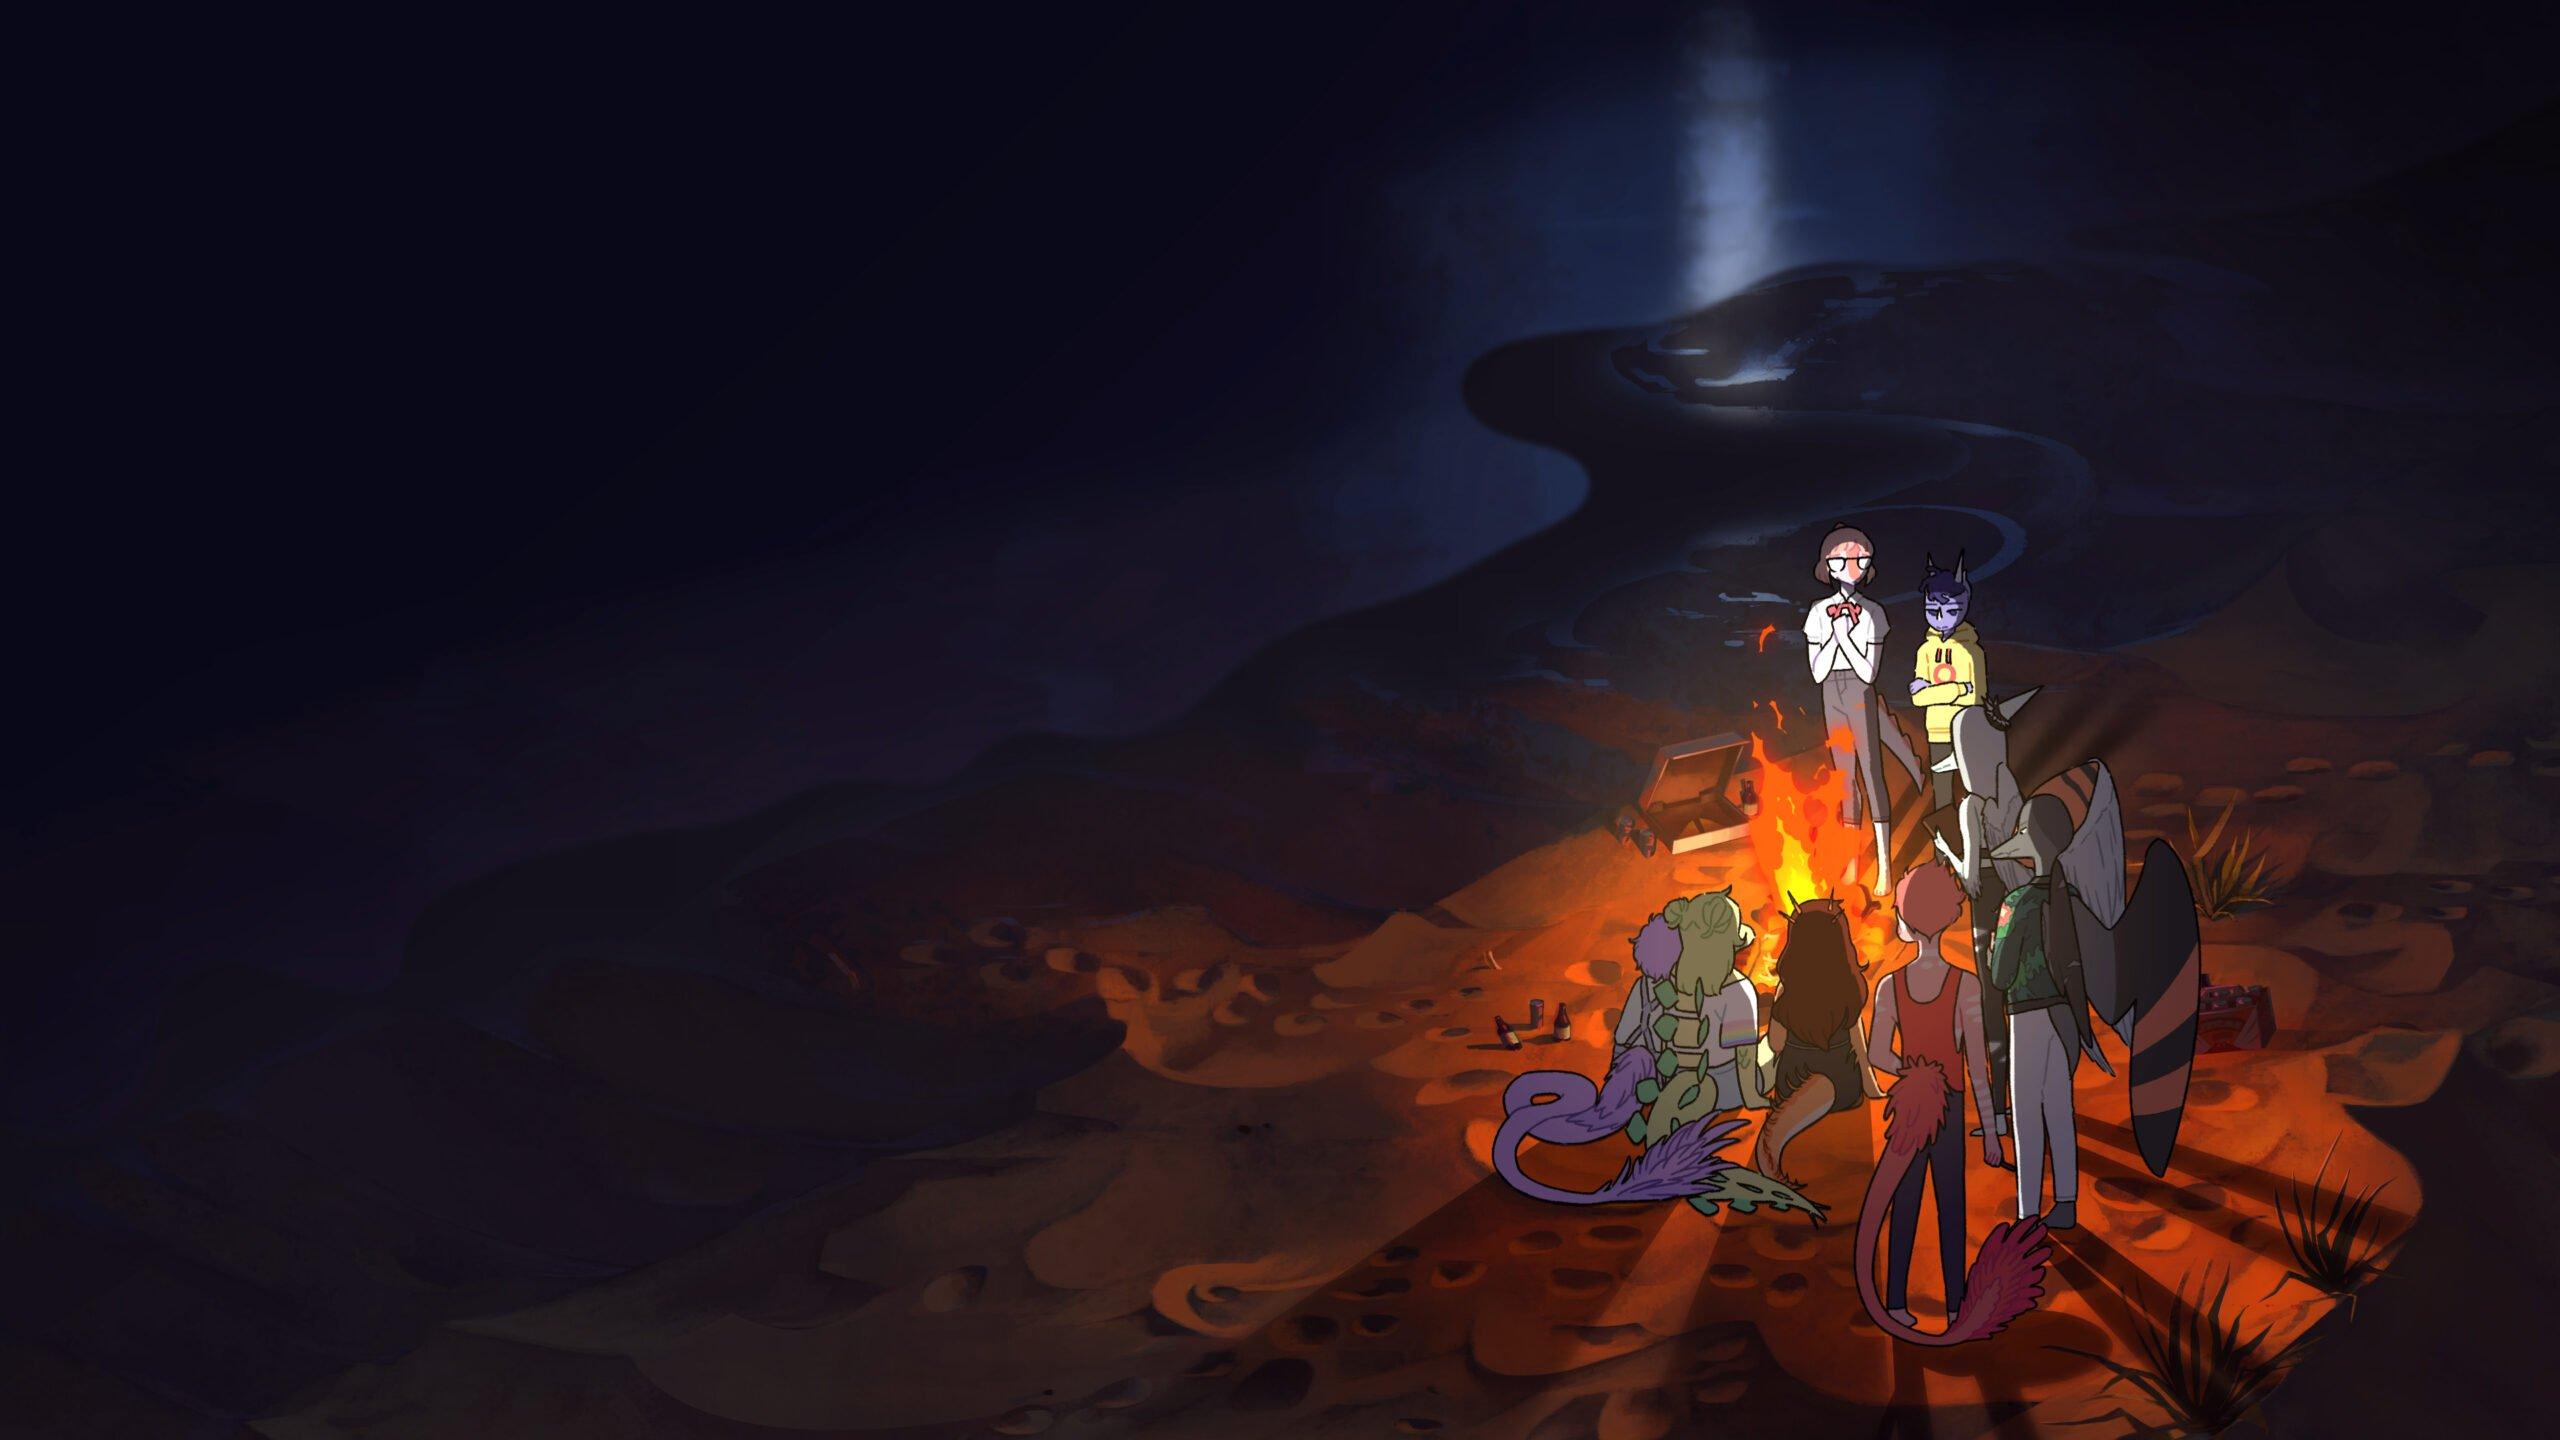 Goodbye-Volcano-High_2020_06-11-20_002